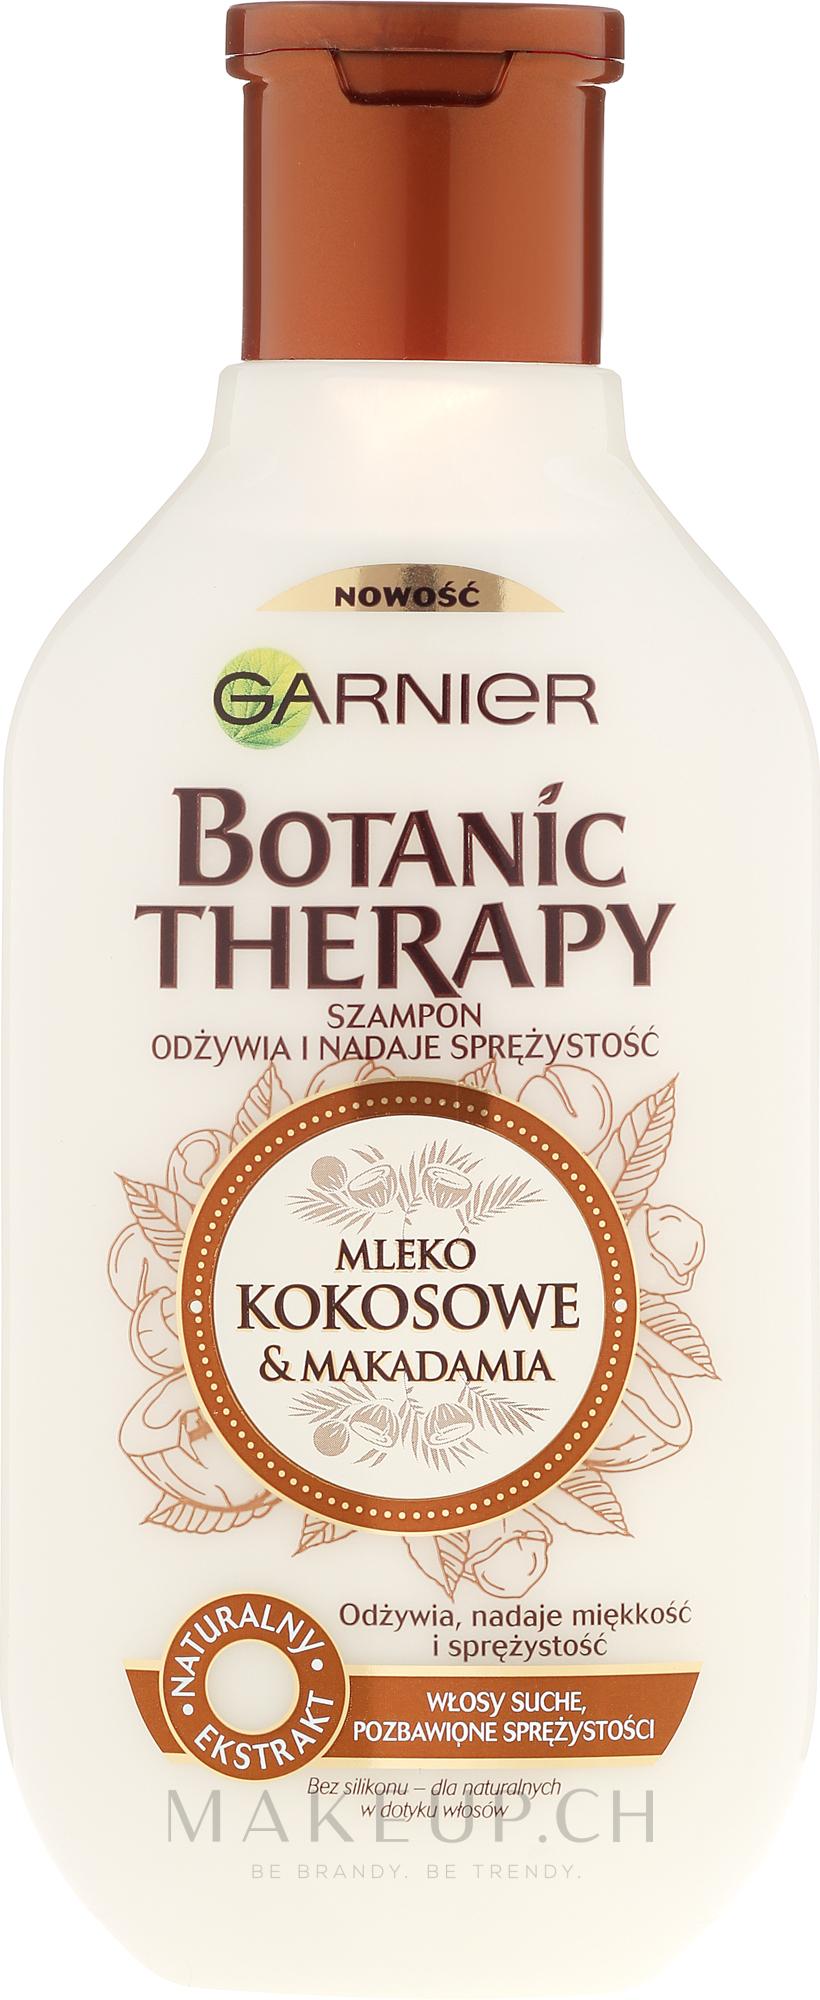 Pflegendes Shampoo mit Kokosmilch und Macadamia - Garnier Botanic Therapy Coconut Milk & Makadamia Shampoo — Bild 250 ml